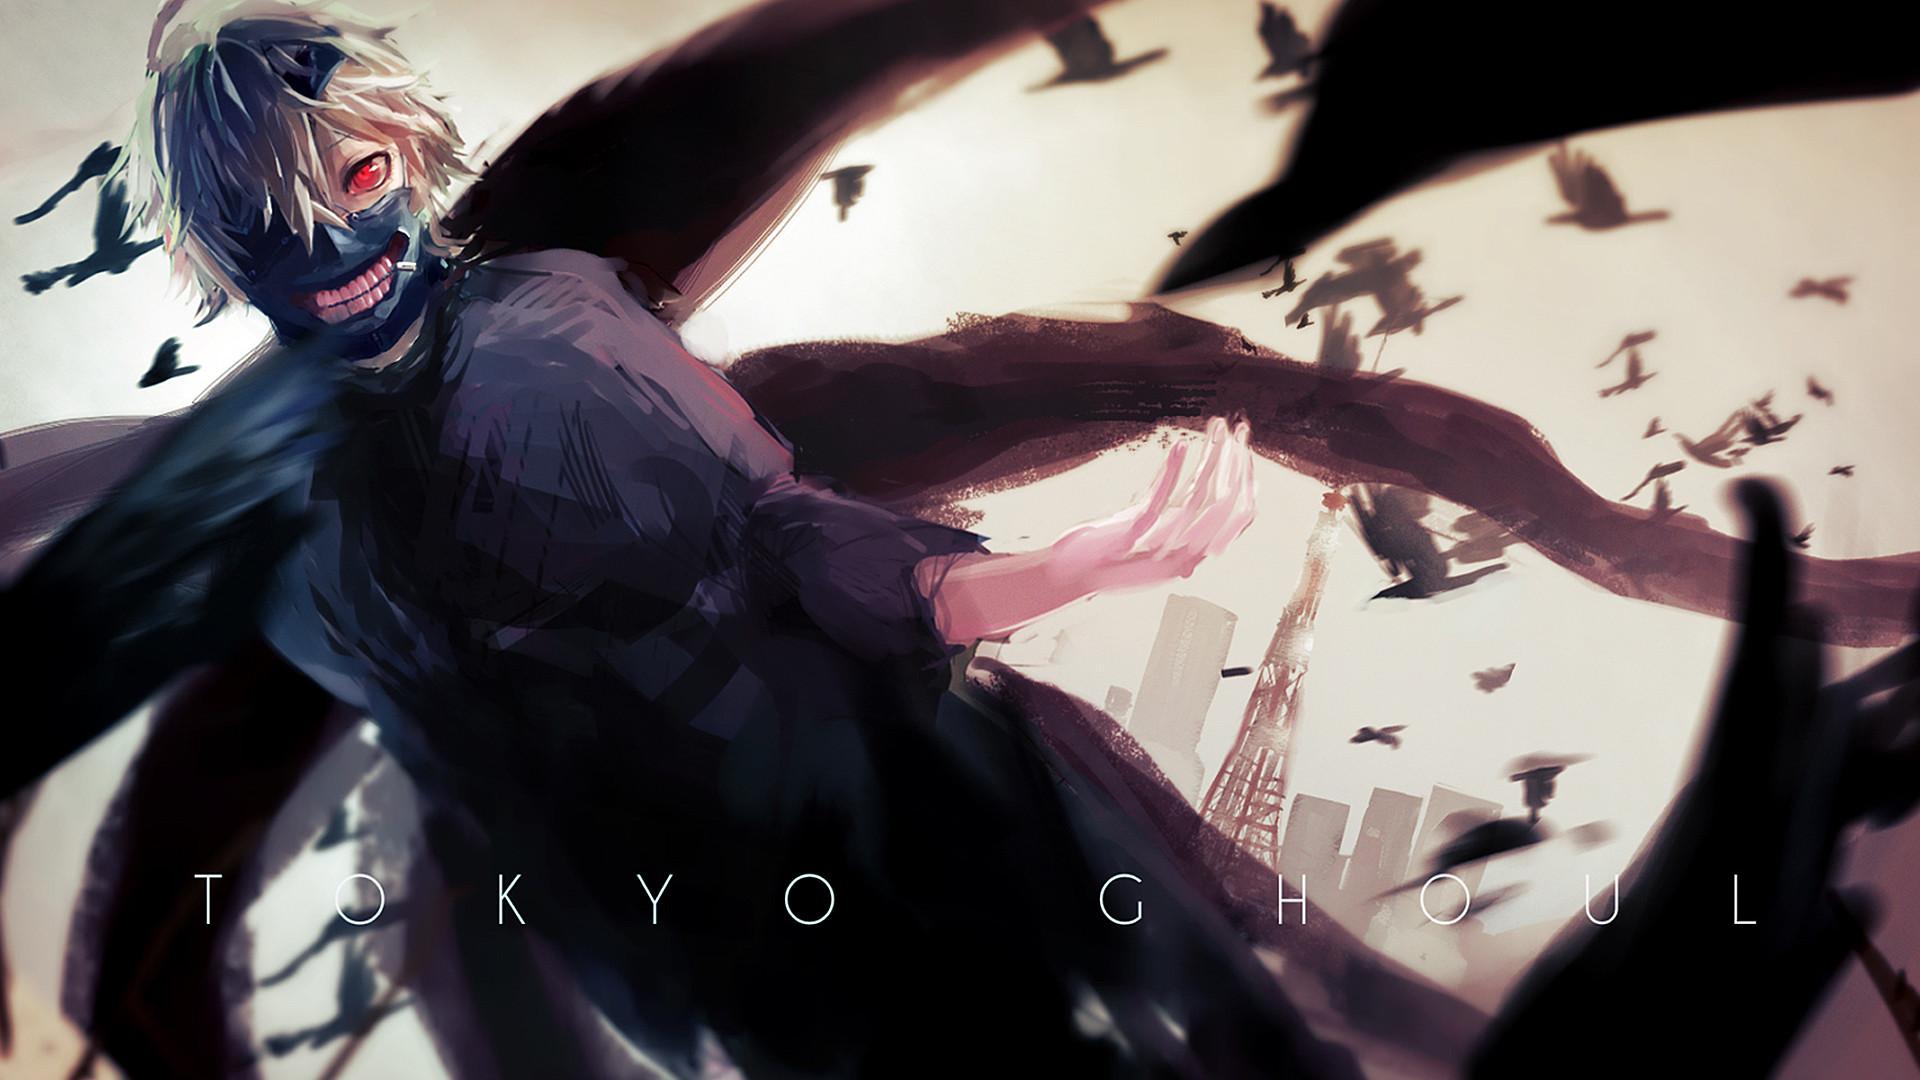 1920x1080 tokyo ghoul desktop backgrounds tokyo ghoul desktop backgrounds 1920x1080